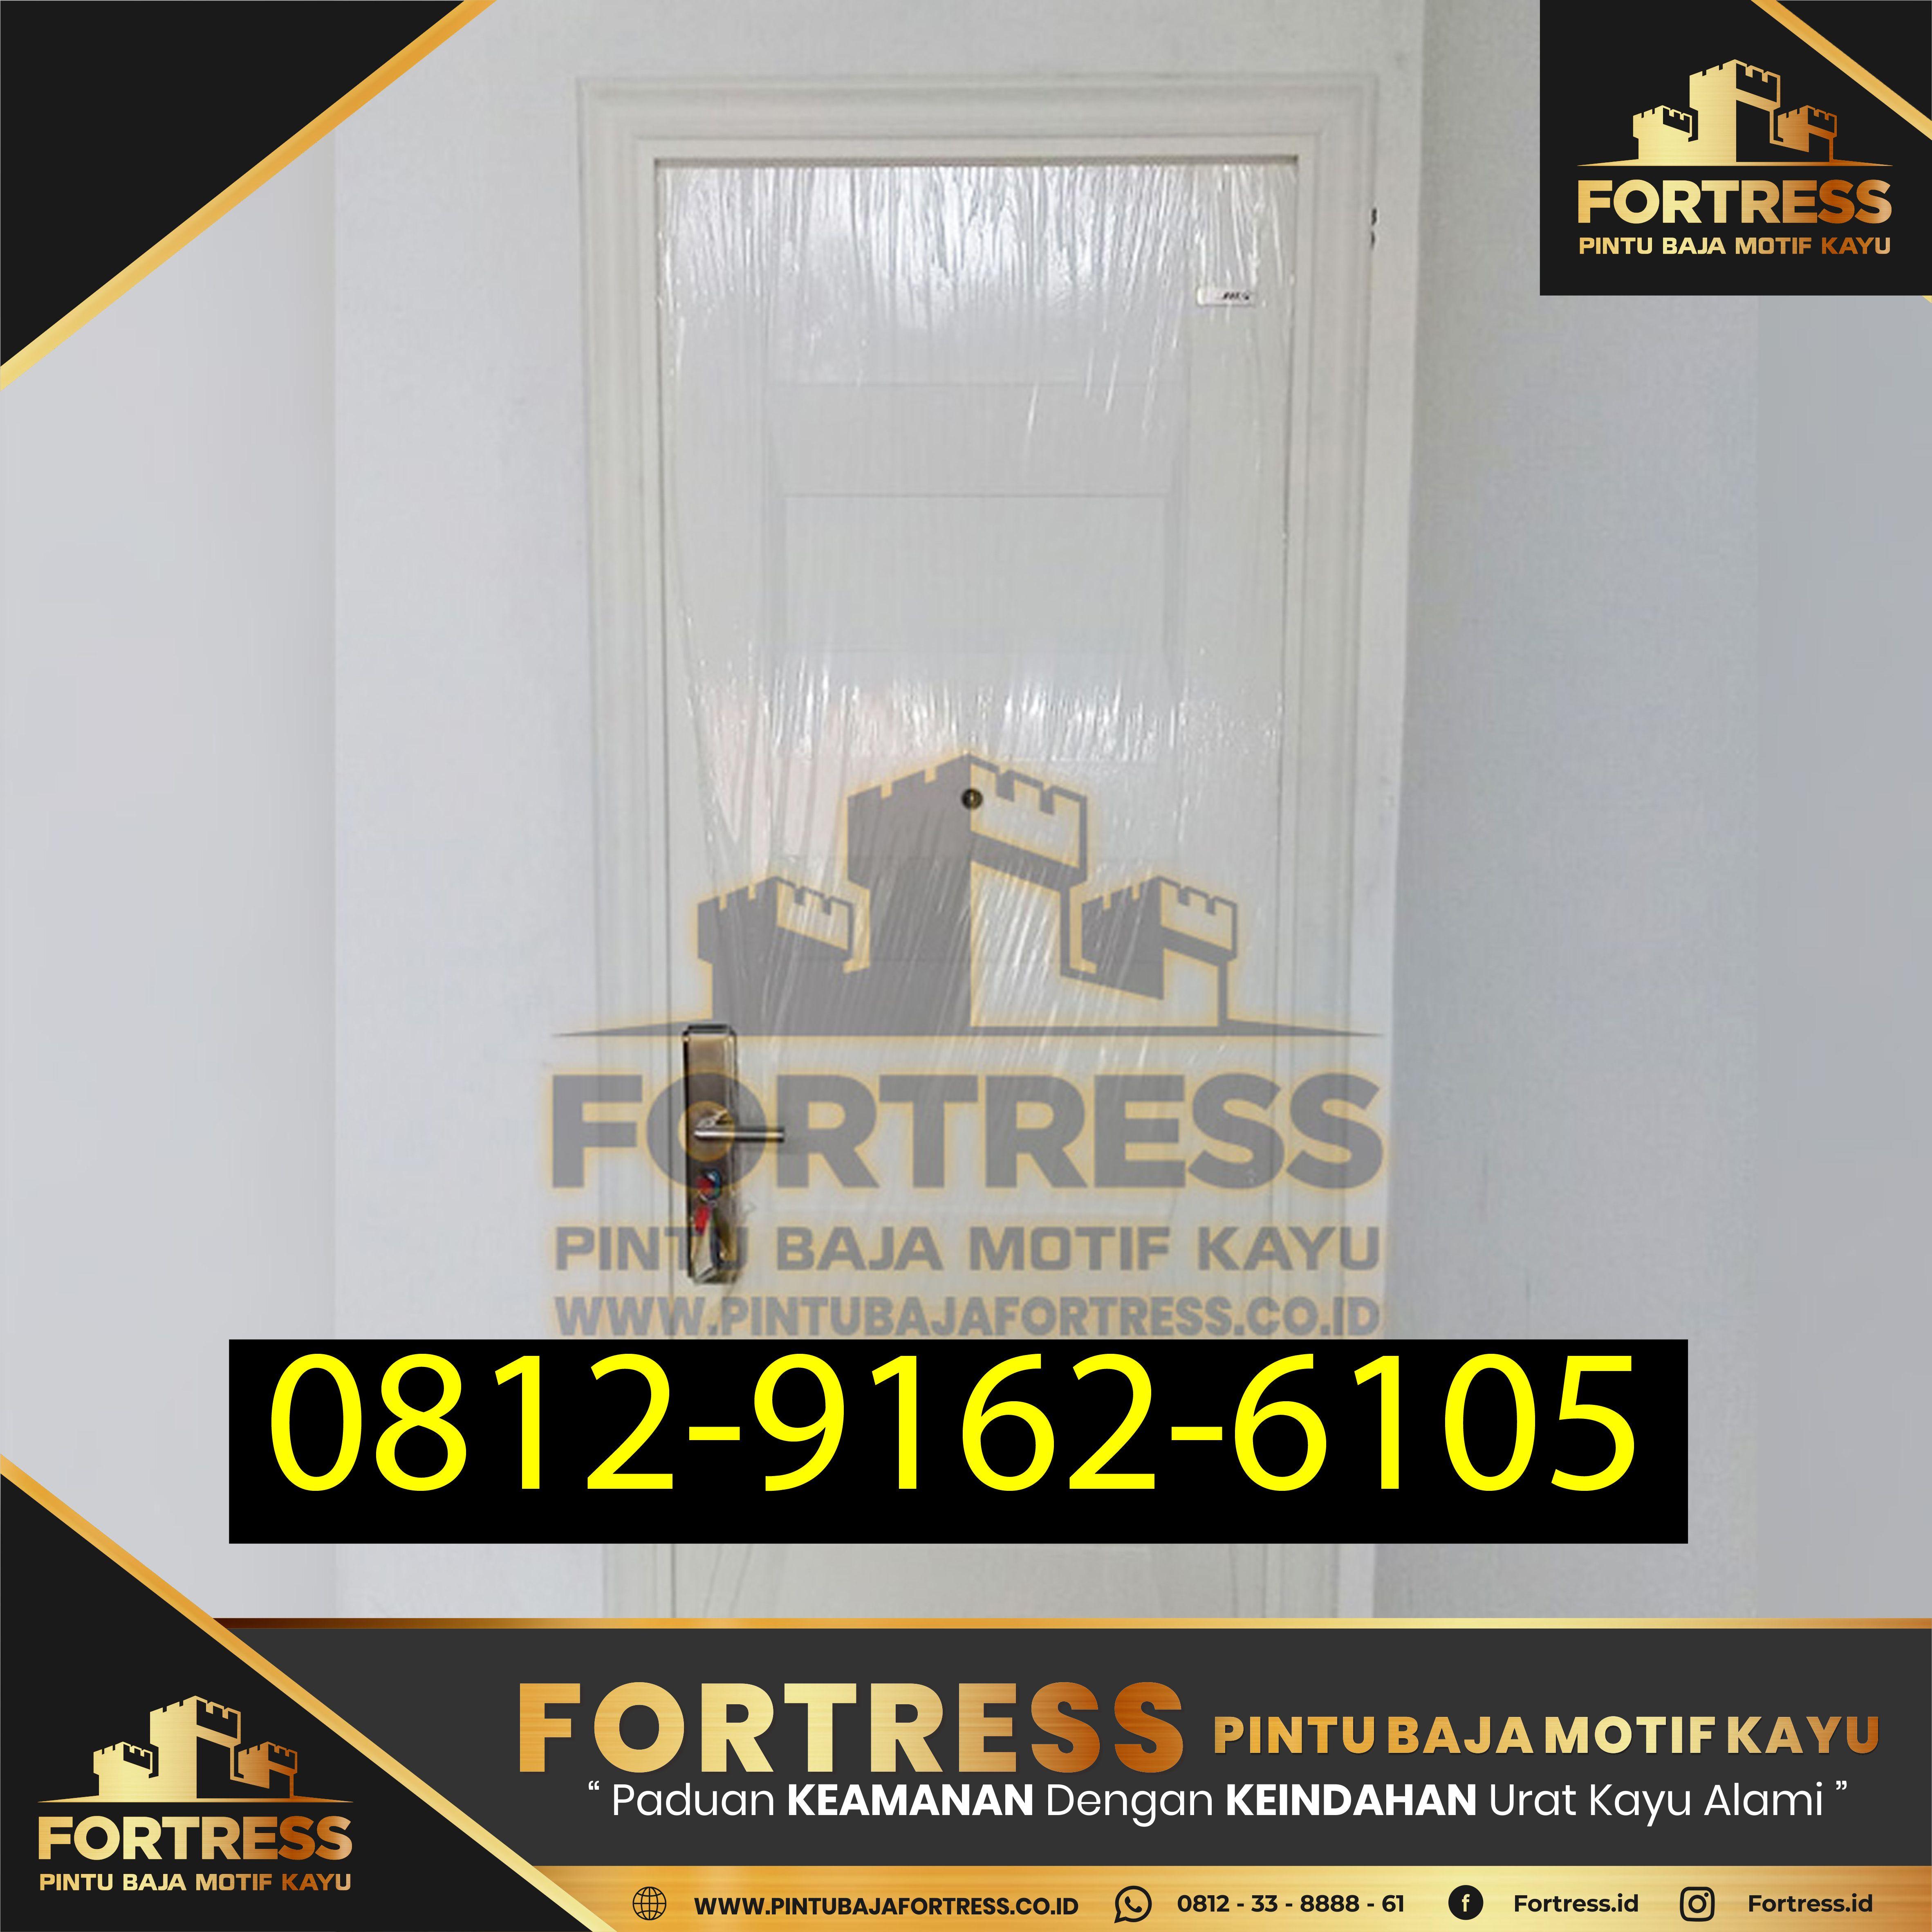 (FORTRESS 0812-9162-6108), Minimalist Door Models,